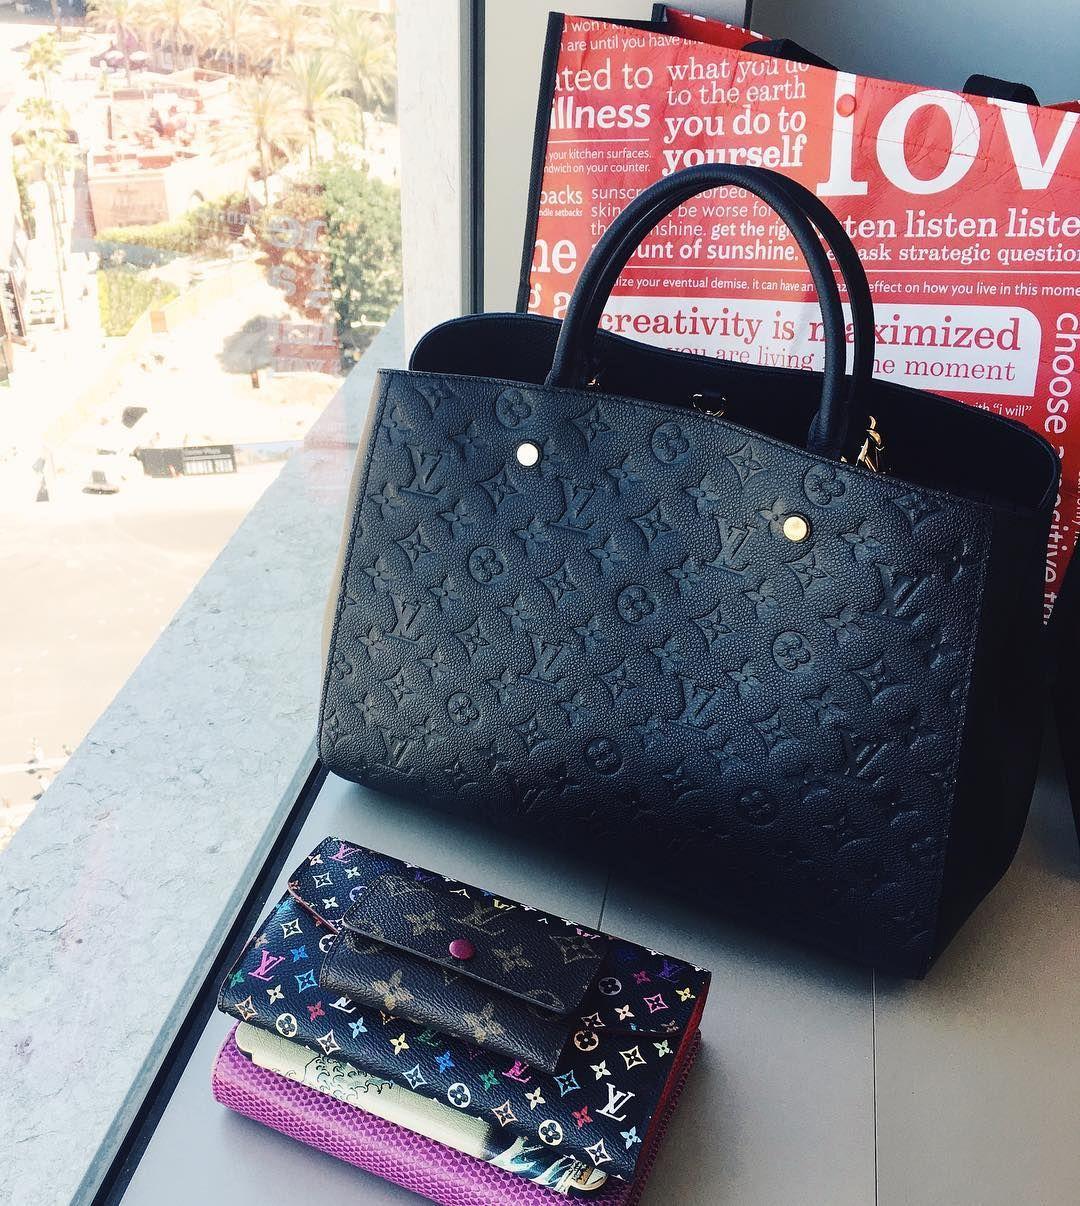 Finally found my perfect work bag Louis Vuitton Montaigne Empreinte GM in  Black Noir 前几个礼拜试了几次chanel shopping tote怎么都觉得不敢放电脑怕包底塌掉 ... cebd58b0e71a7